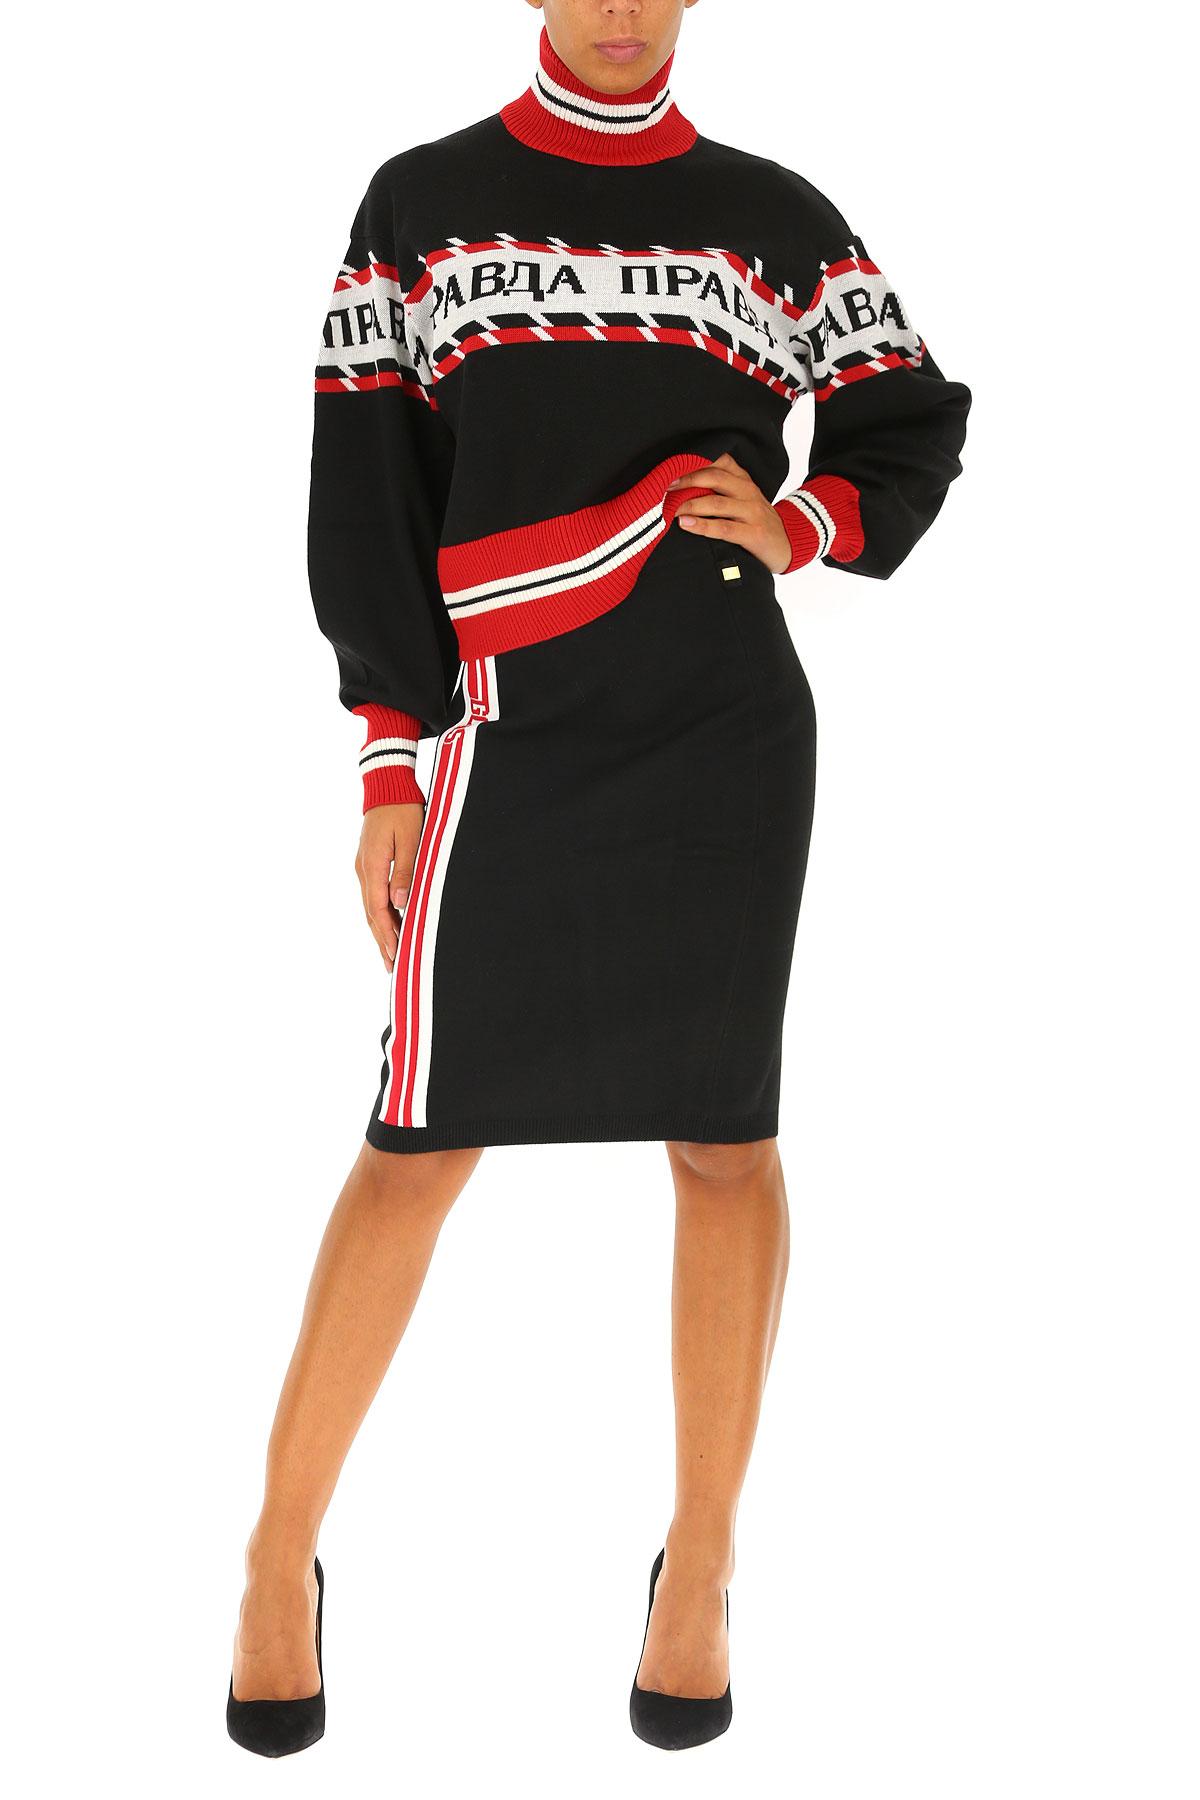 2018 Para Negro 19 Mujer Ropa Msgm nbsp;blanco invierno Otoño Rojo nSXxO4qU6w